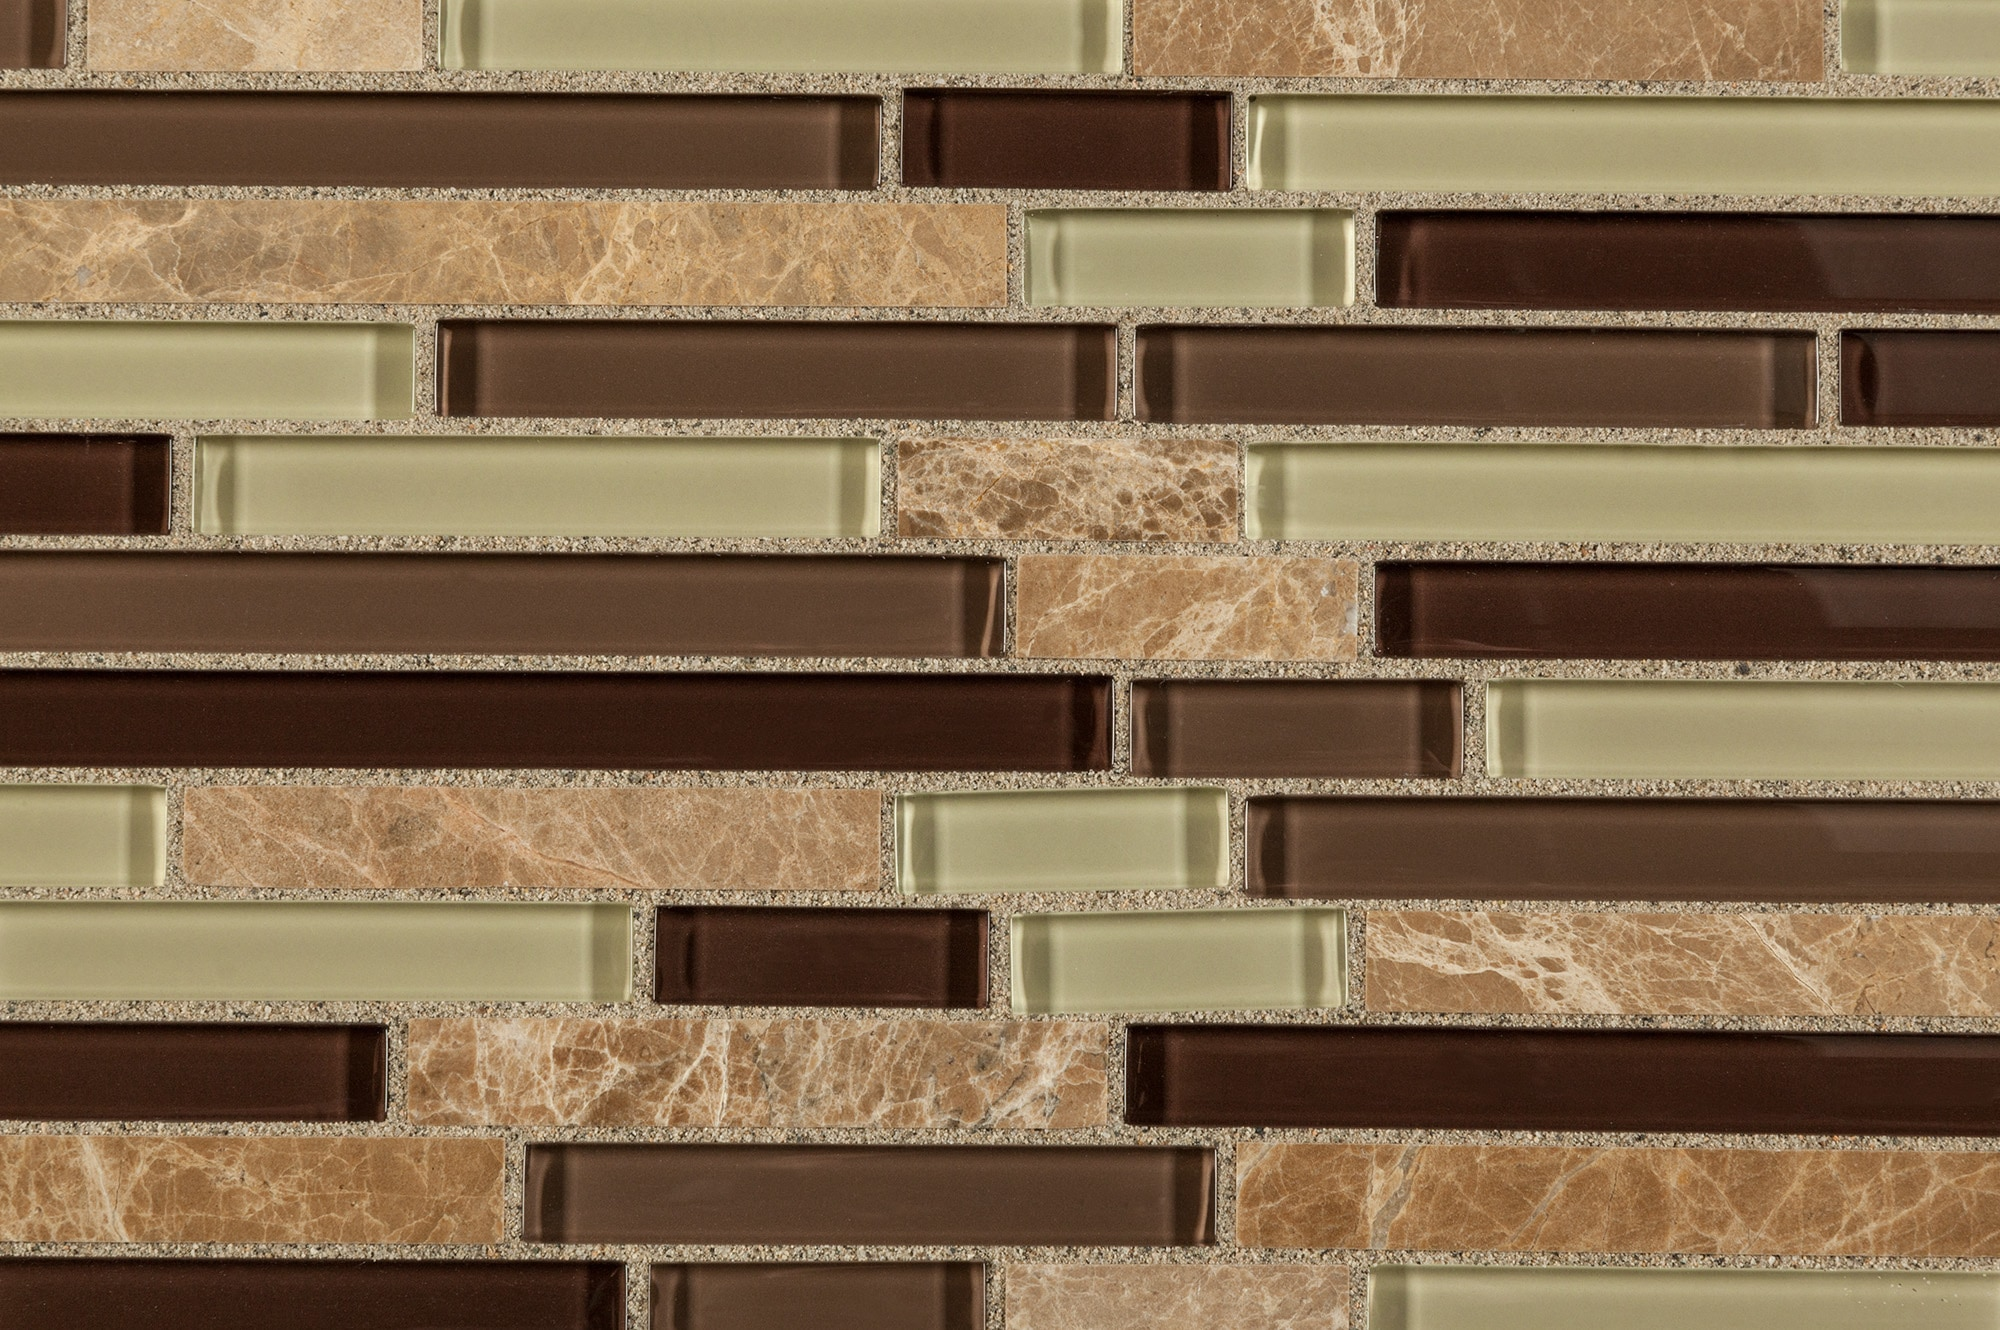 Cabot Mosaic Tile Glass Stone Blends Aspen Interlocking Pattern